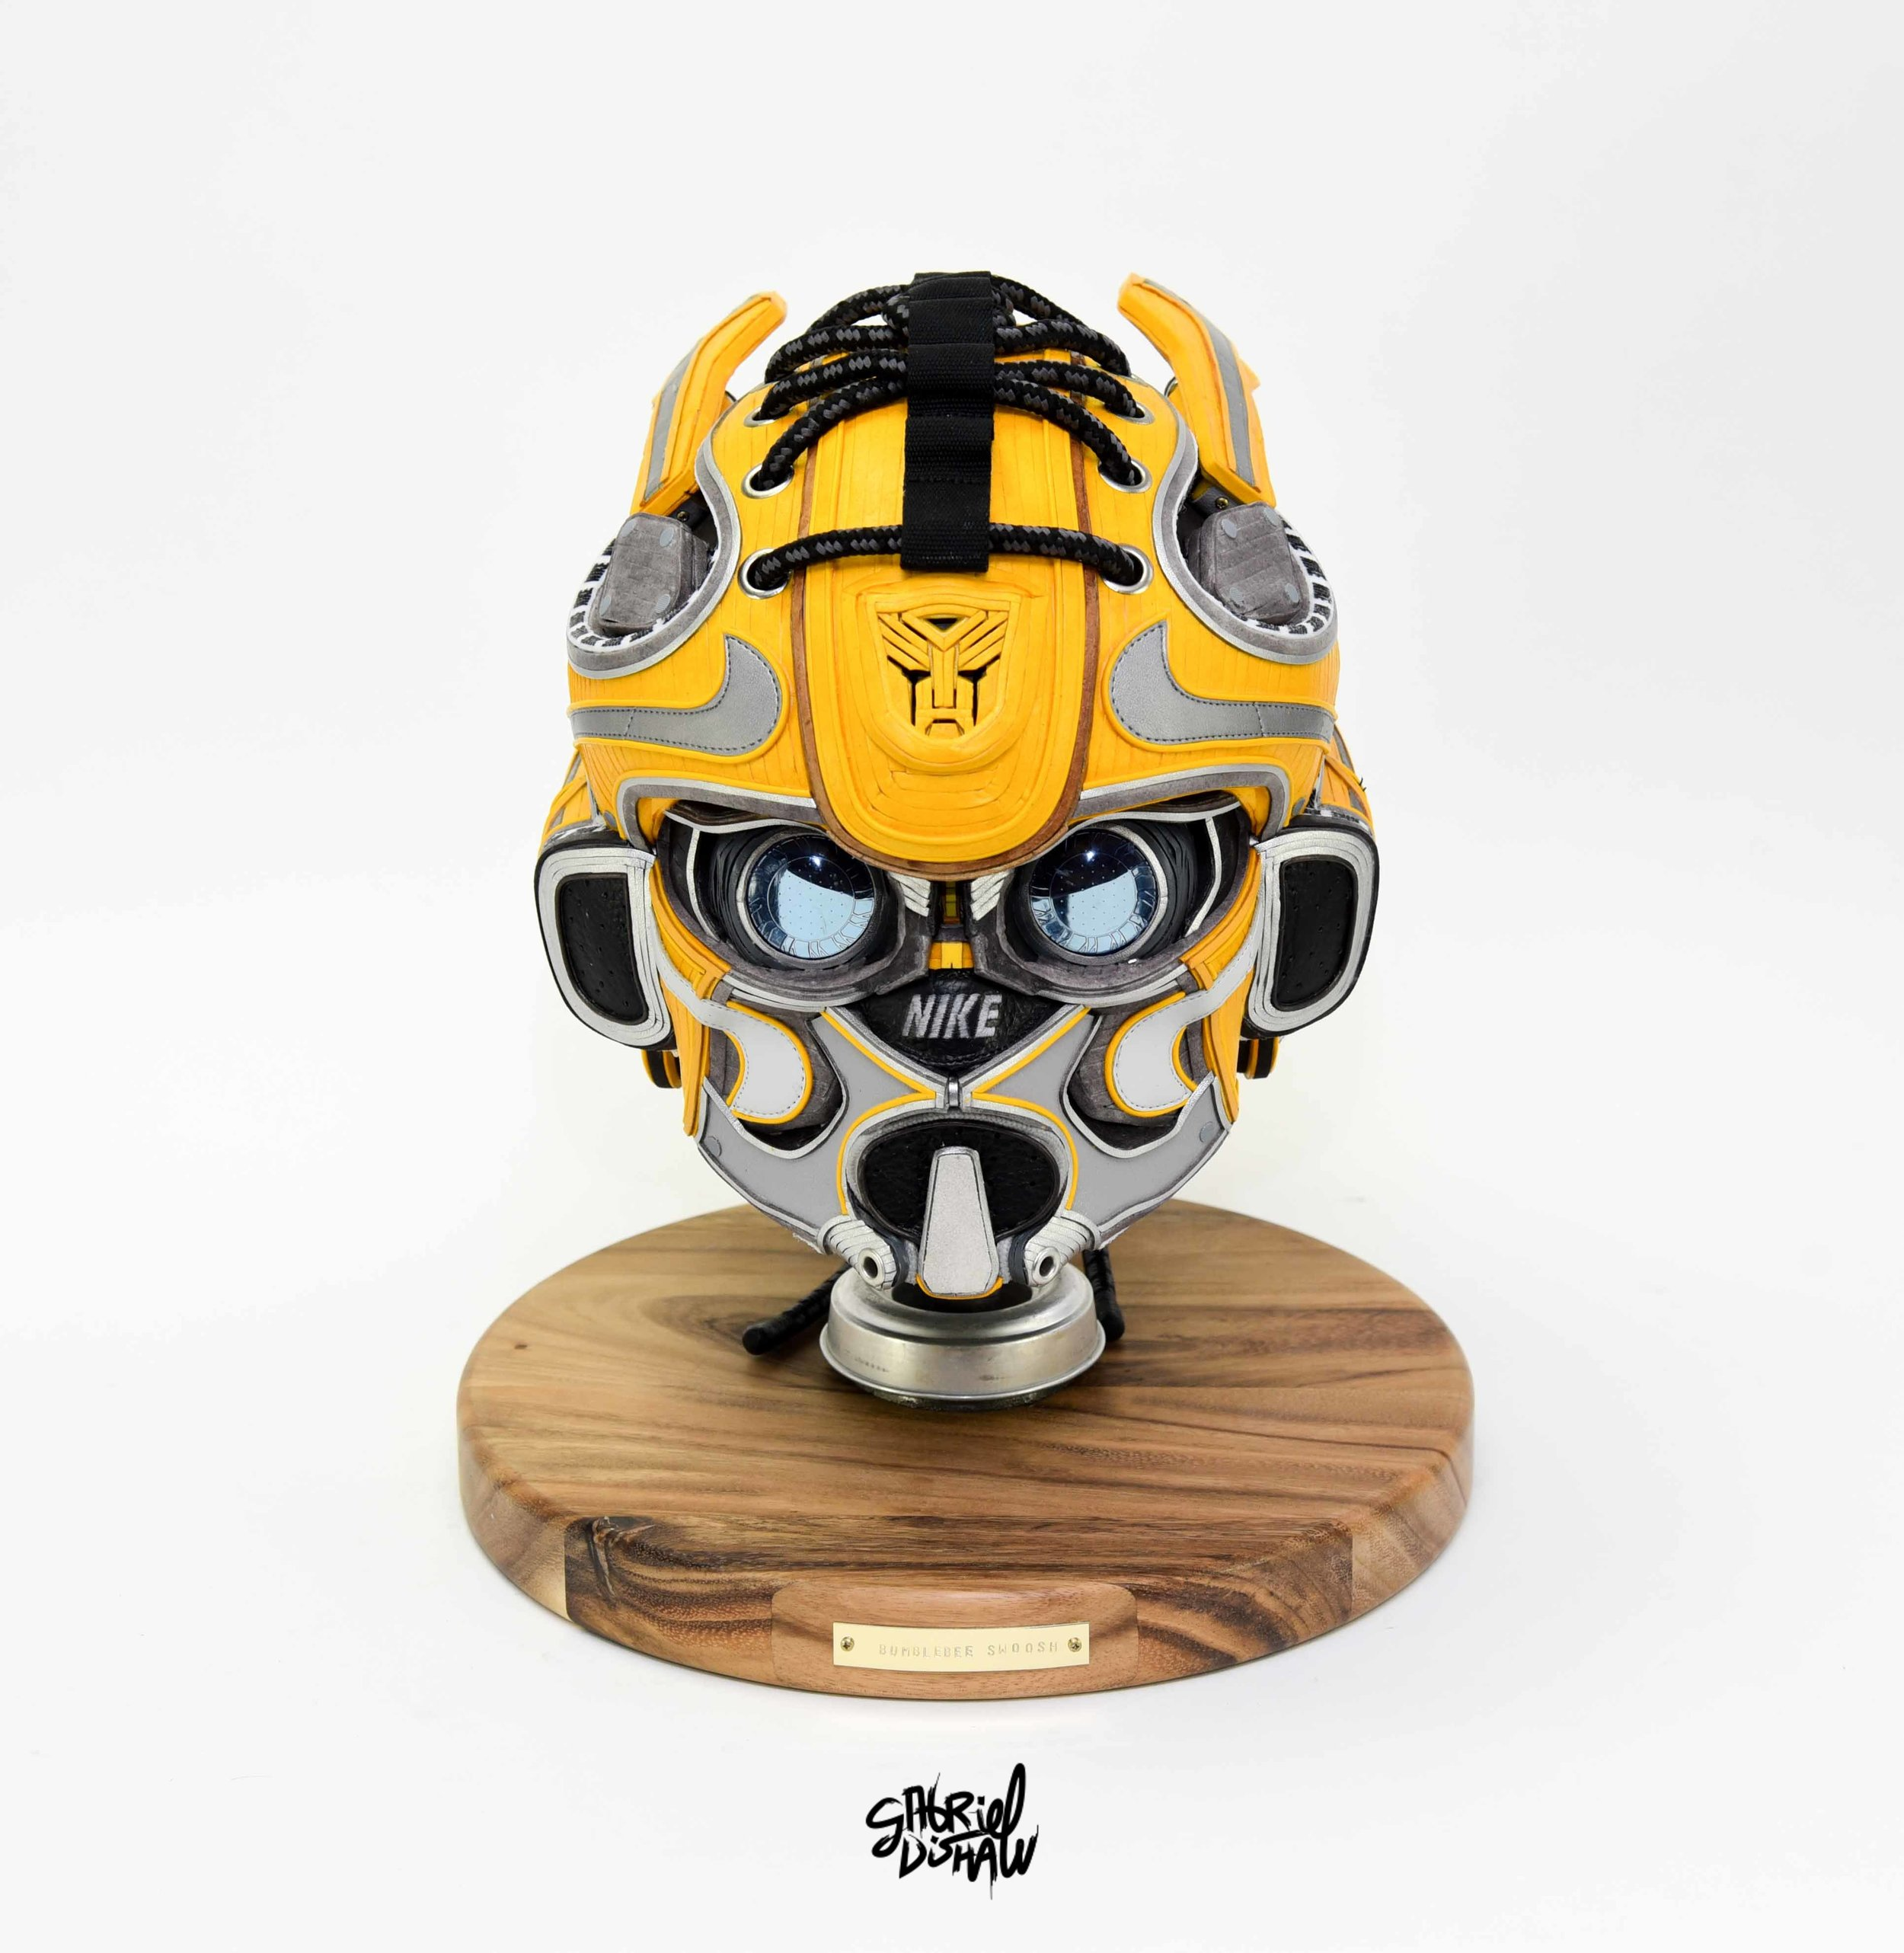 Gabriel Dishaw Bumblebee Swoosh-8643.jpg